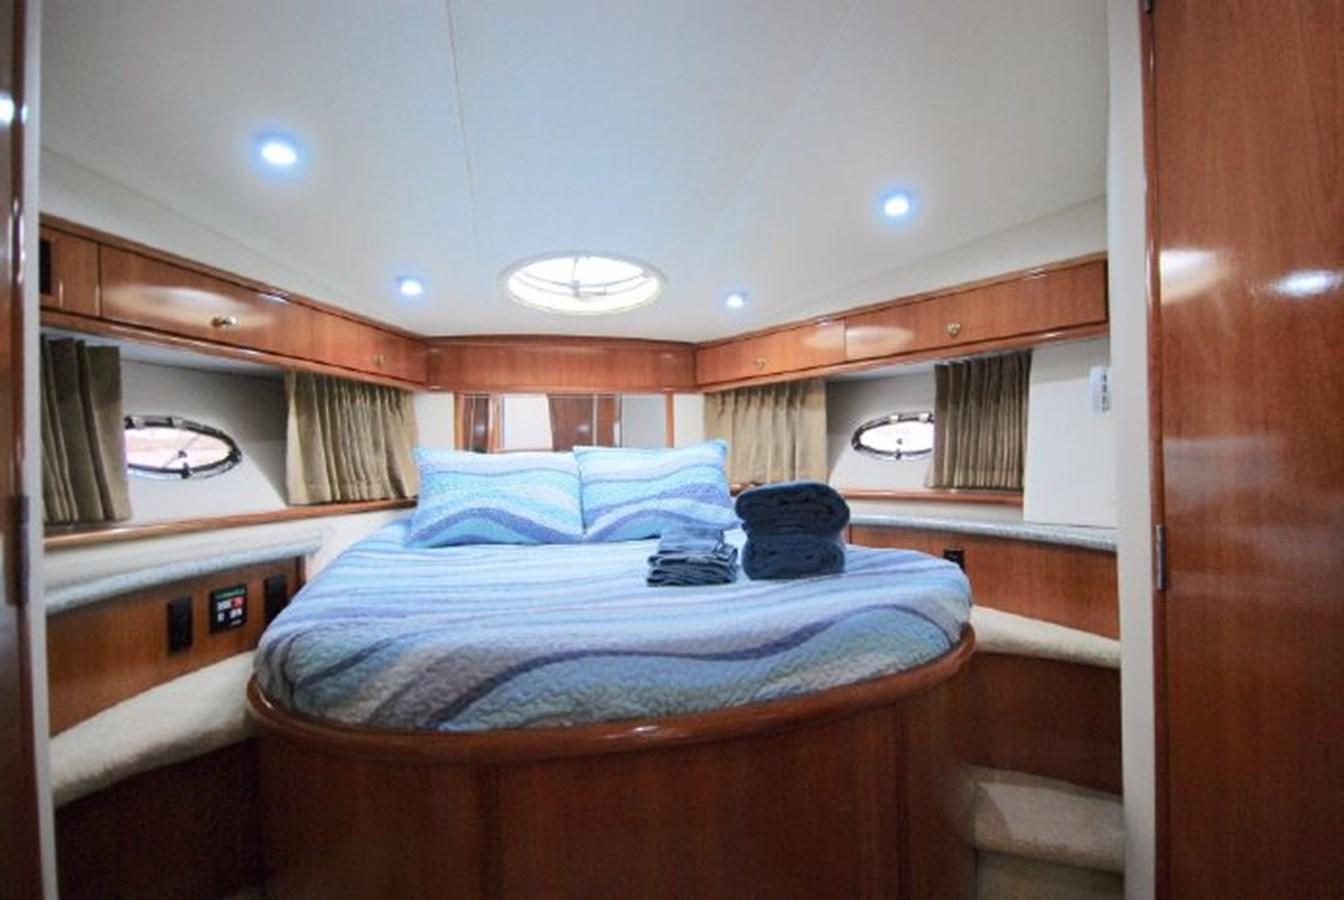 19 2001 CARVER 444 Cockpit Motor yacht Motor Yacht 2885795